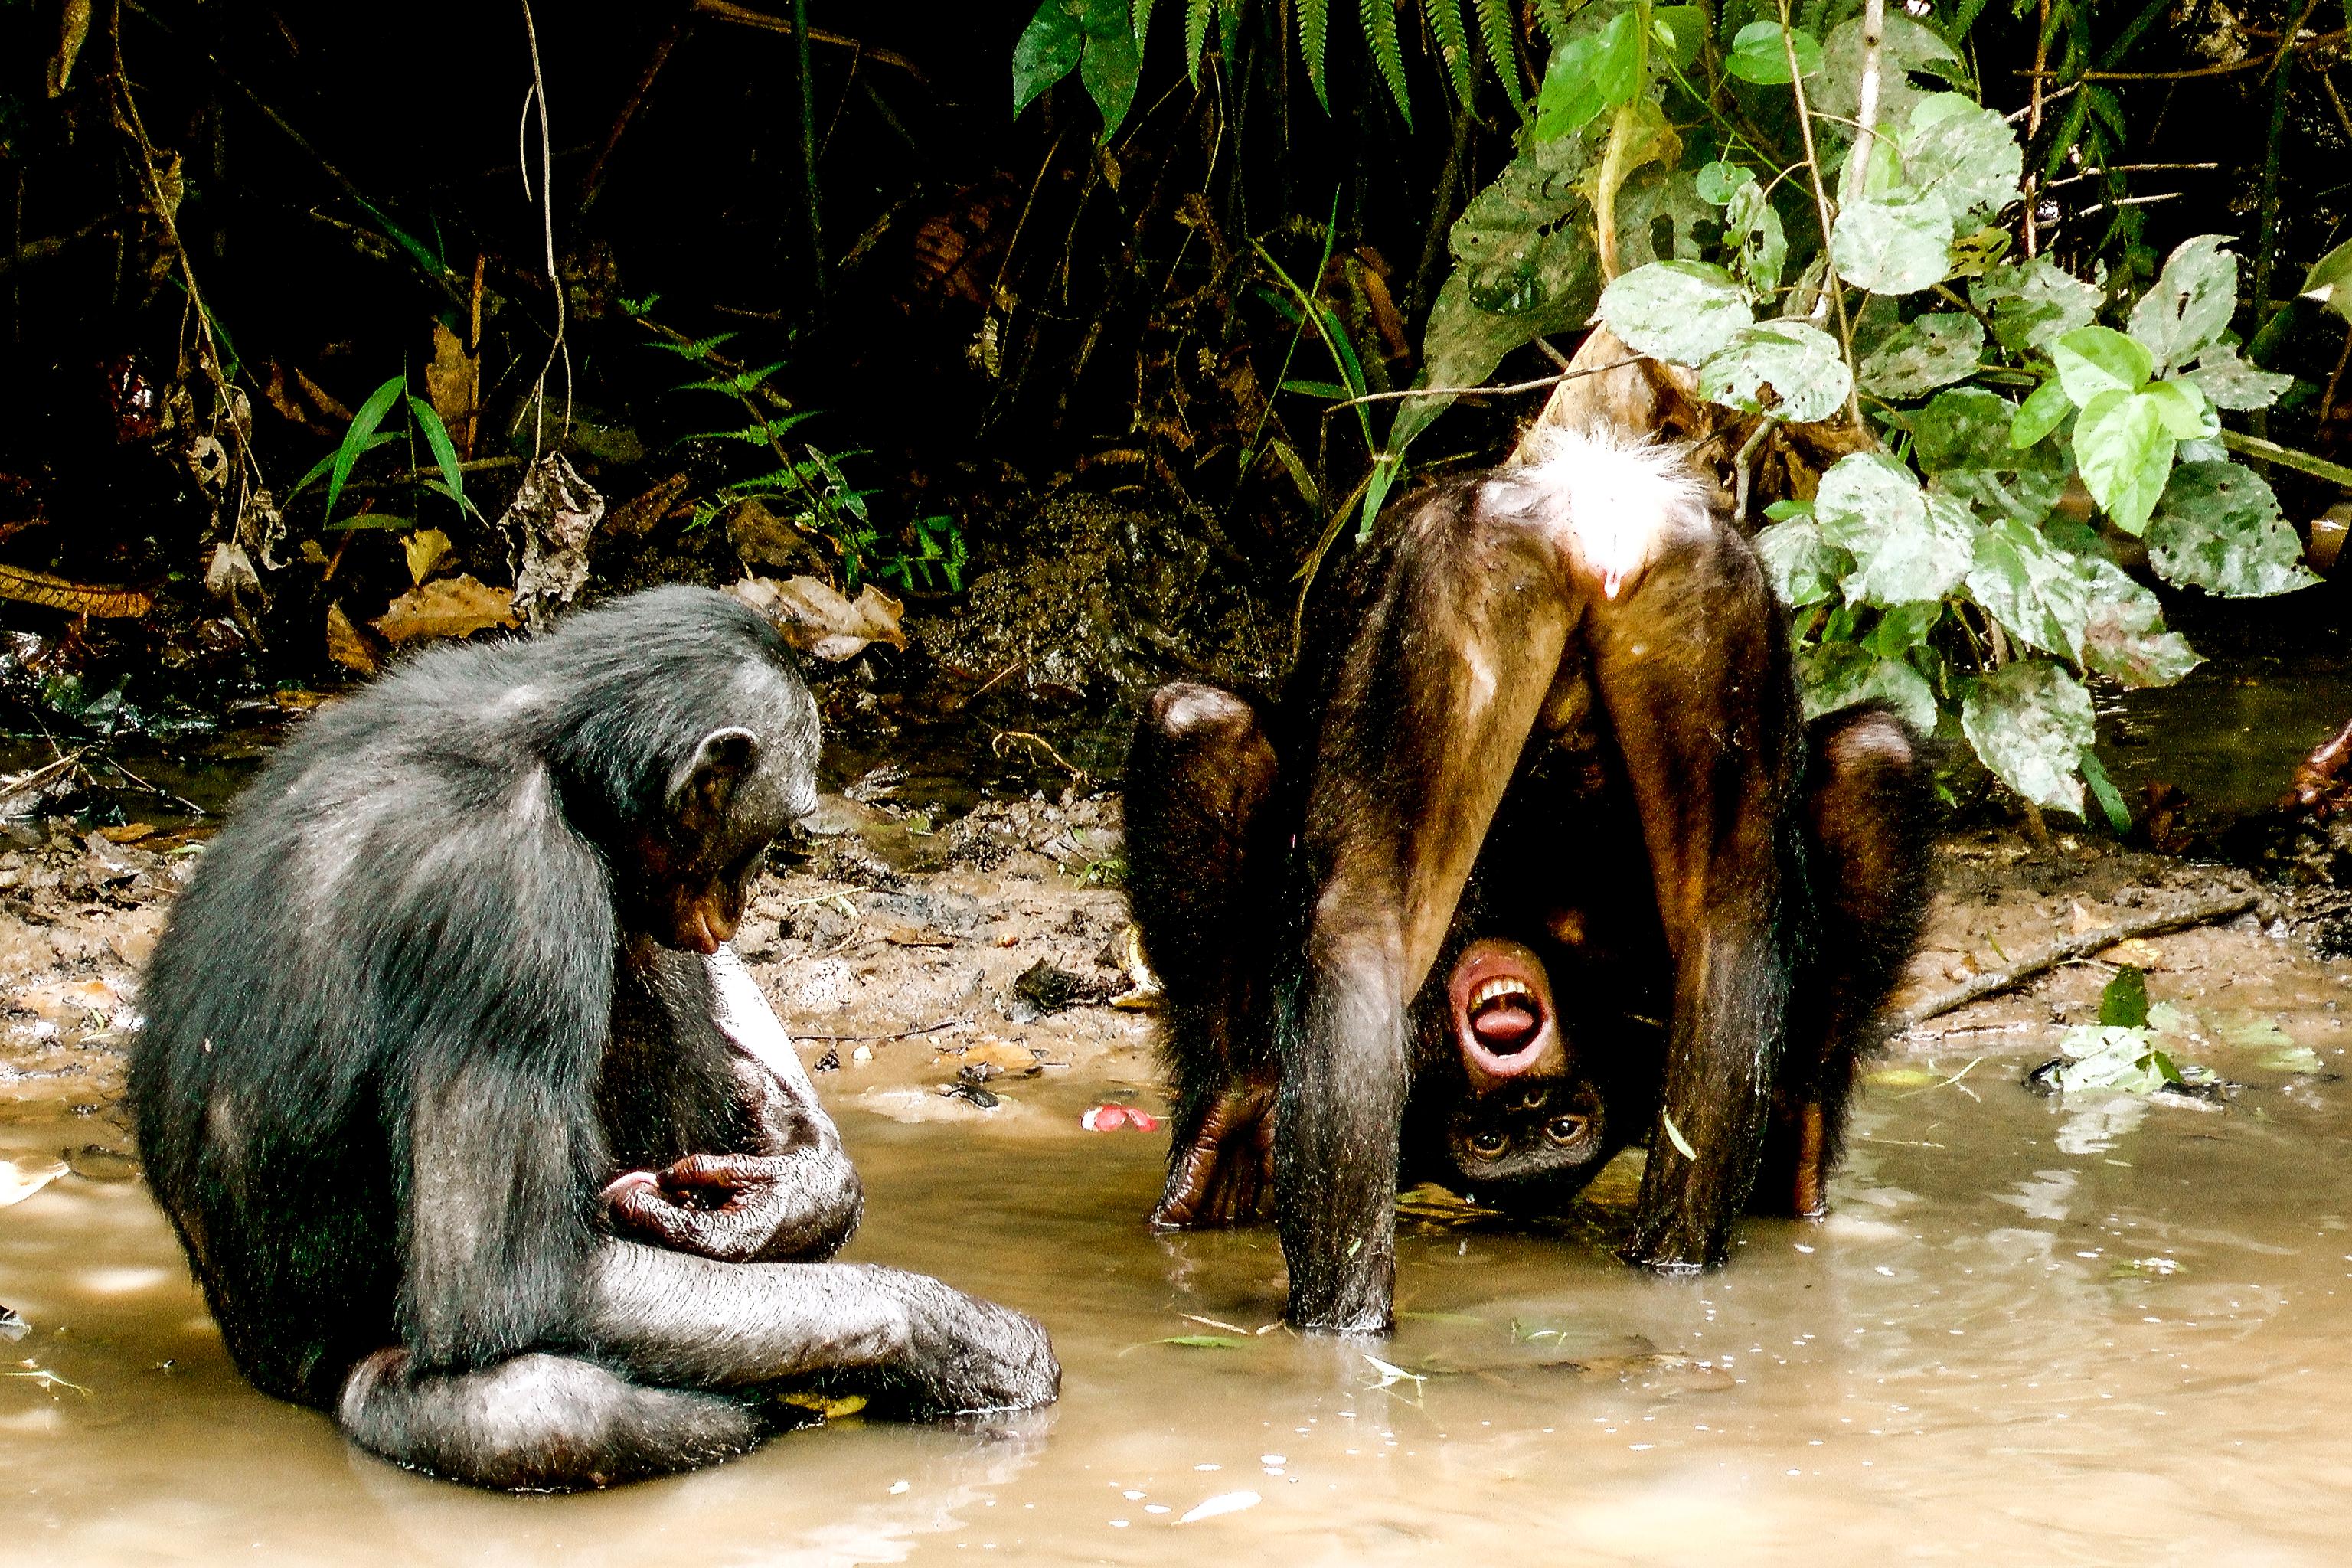 Un encuentro entre dos bonobos